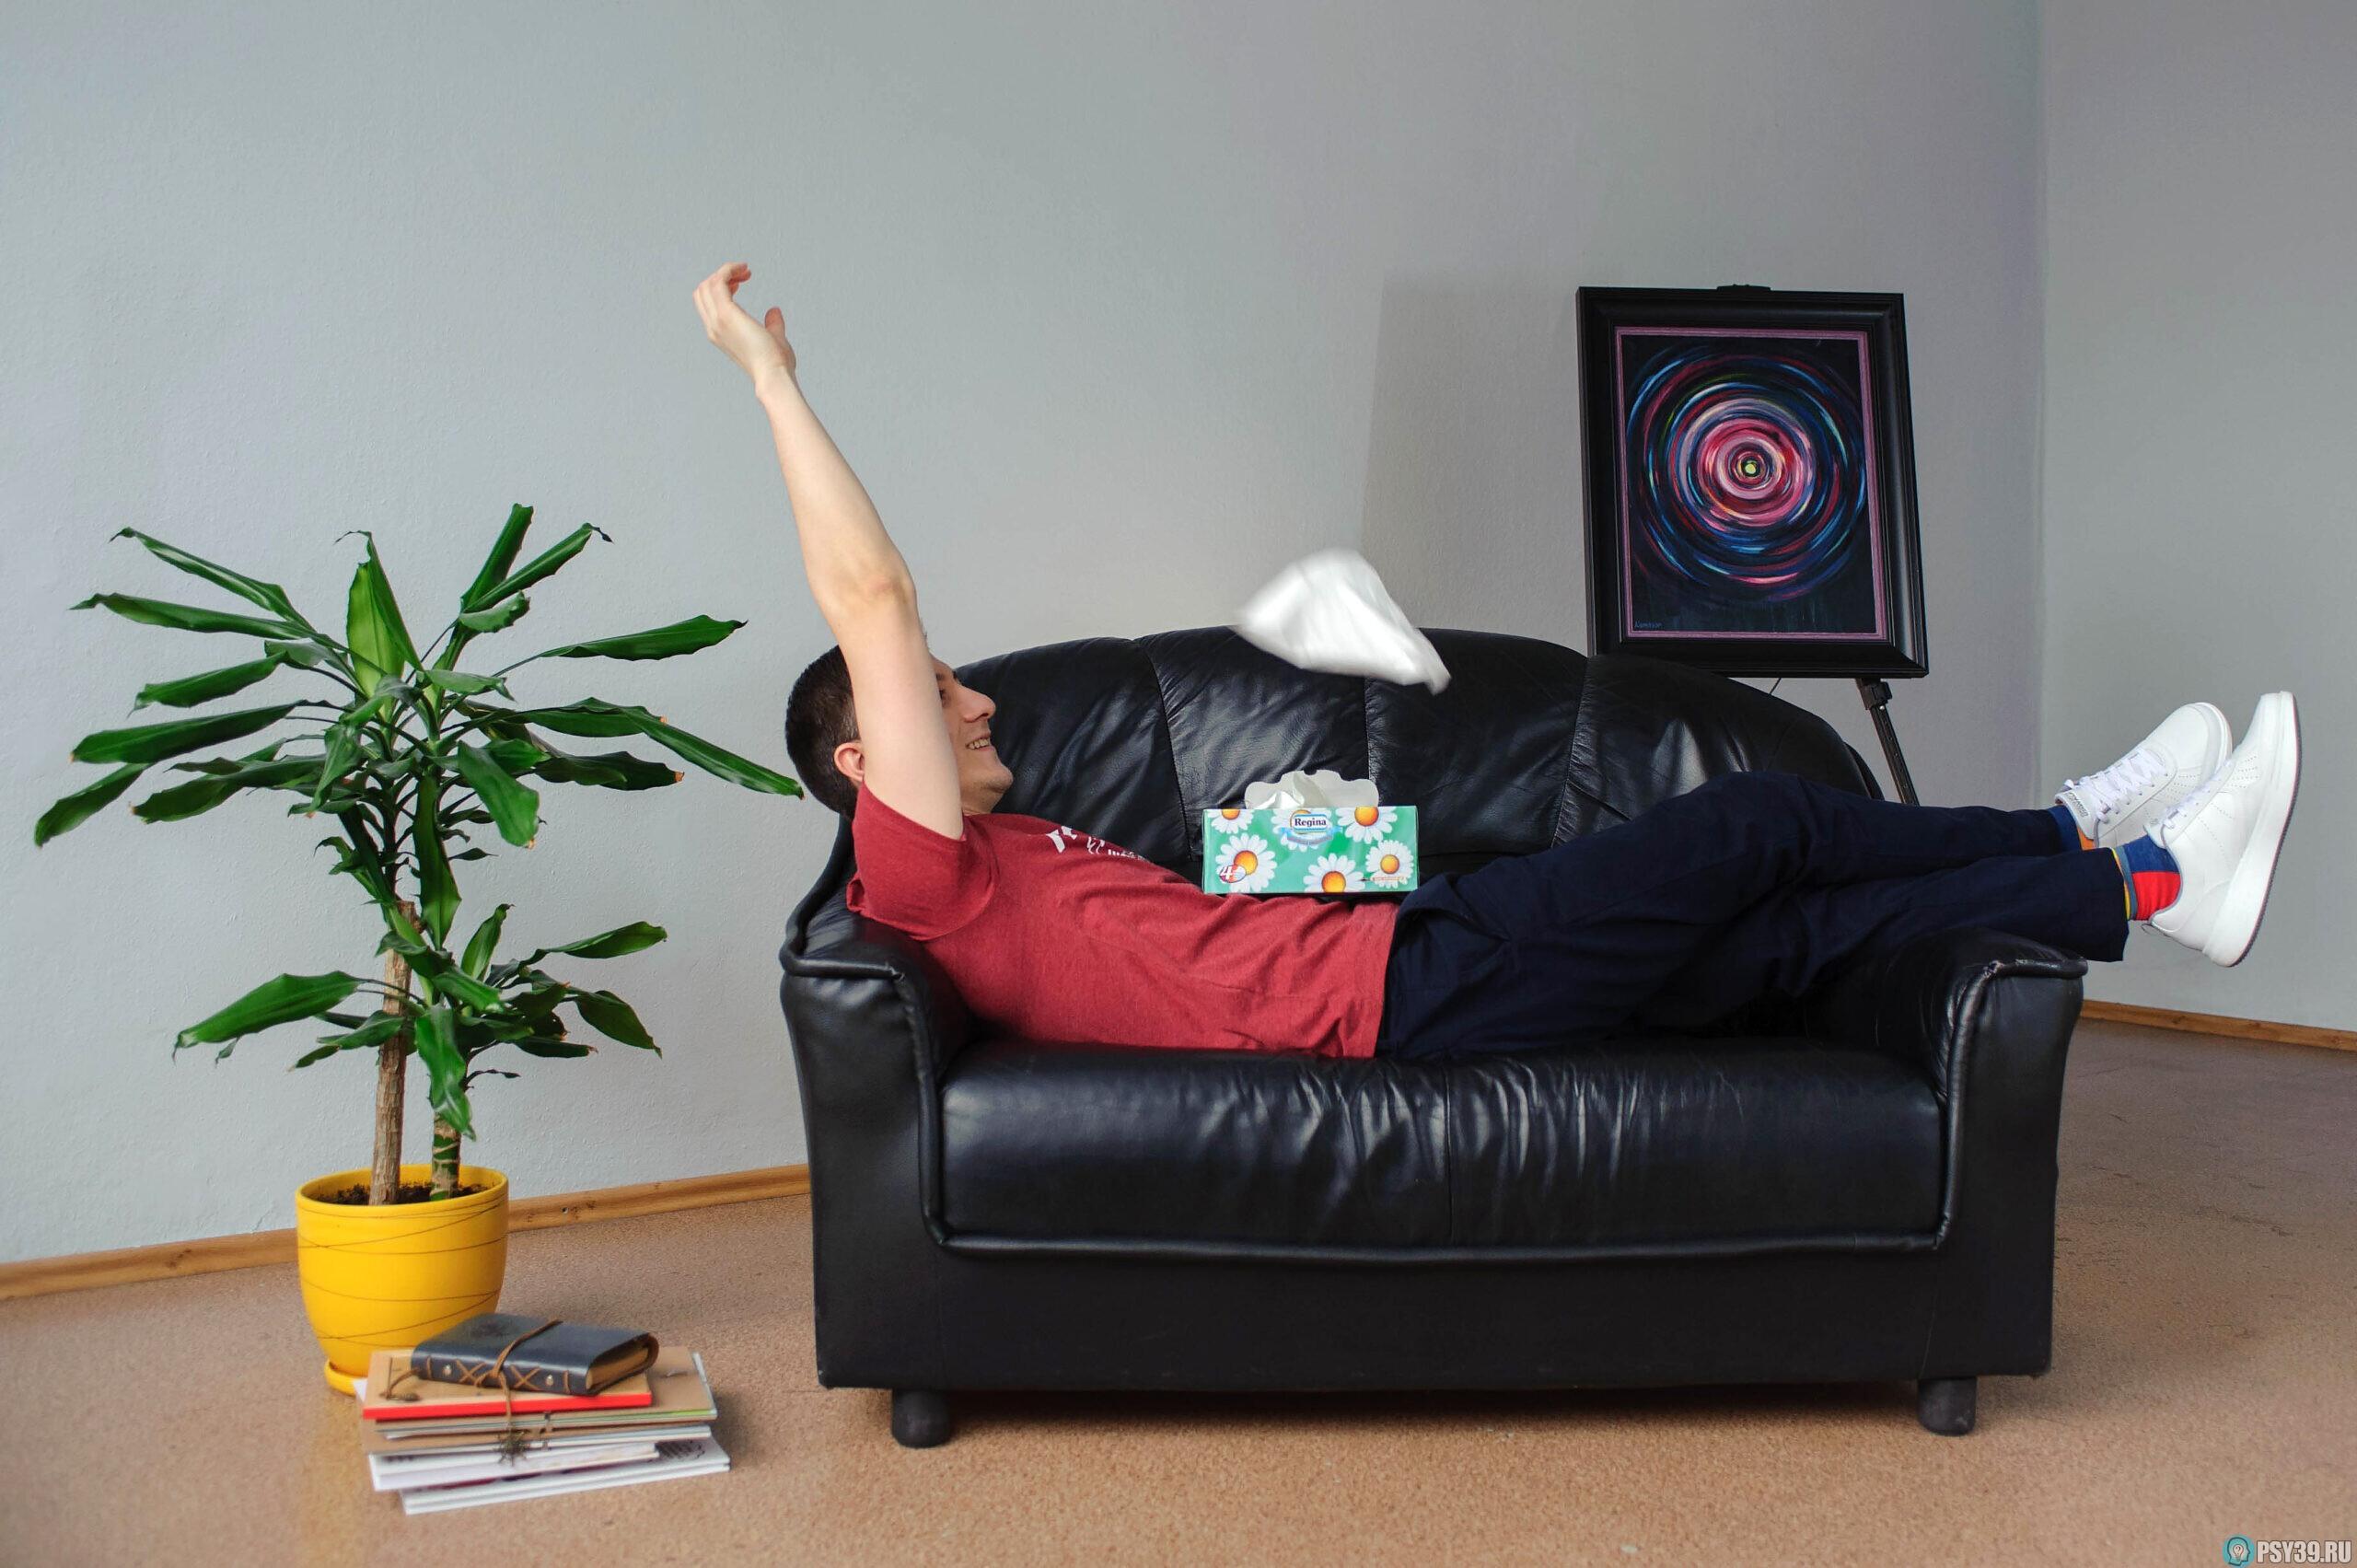 психолог сексолог как не стыдно сексолог онлайн